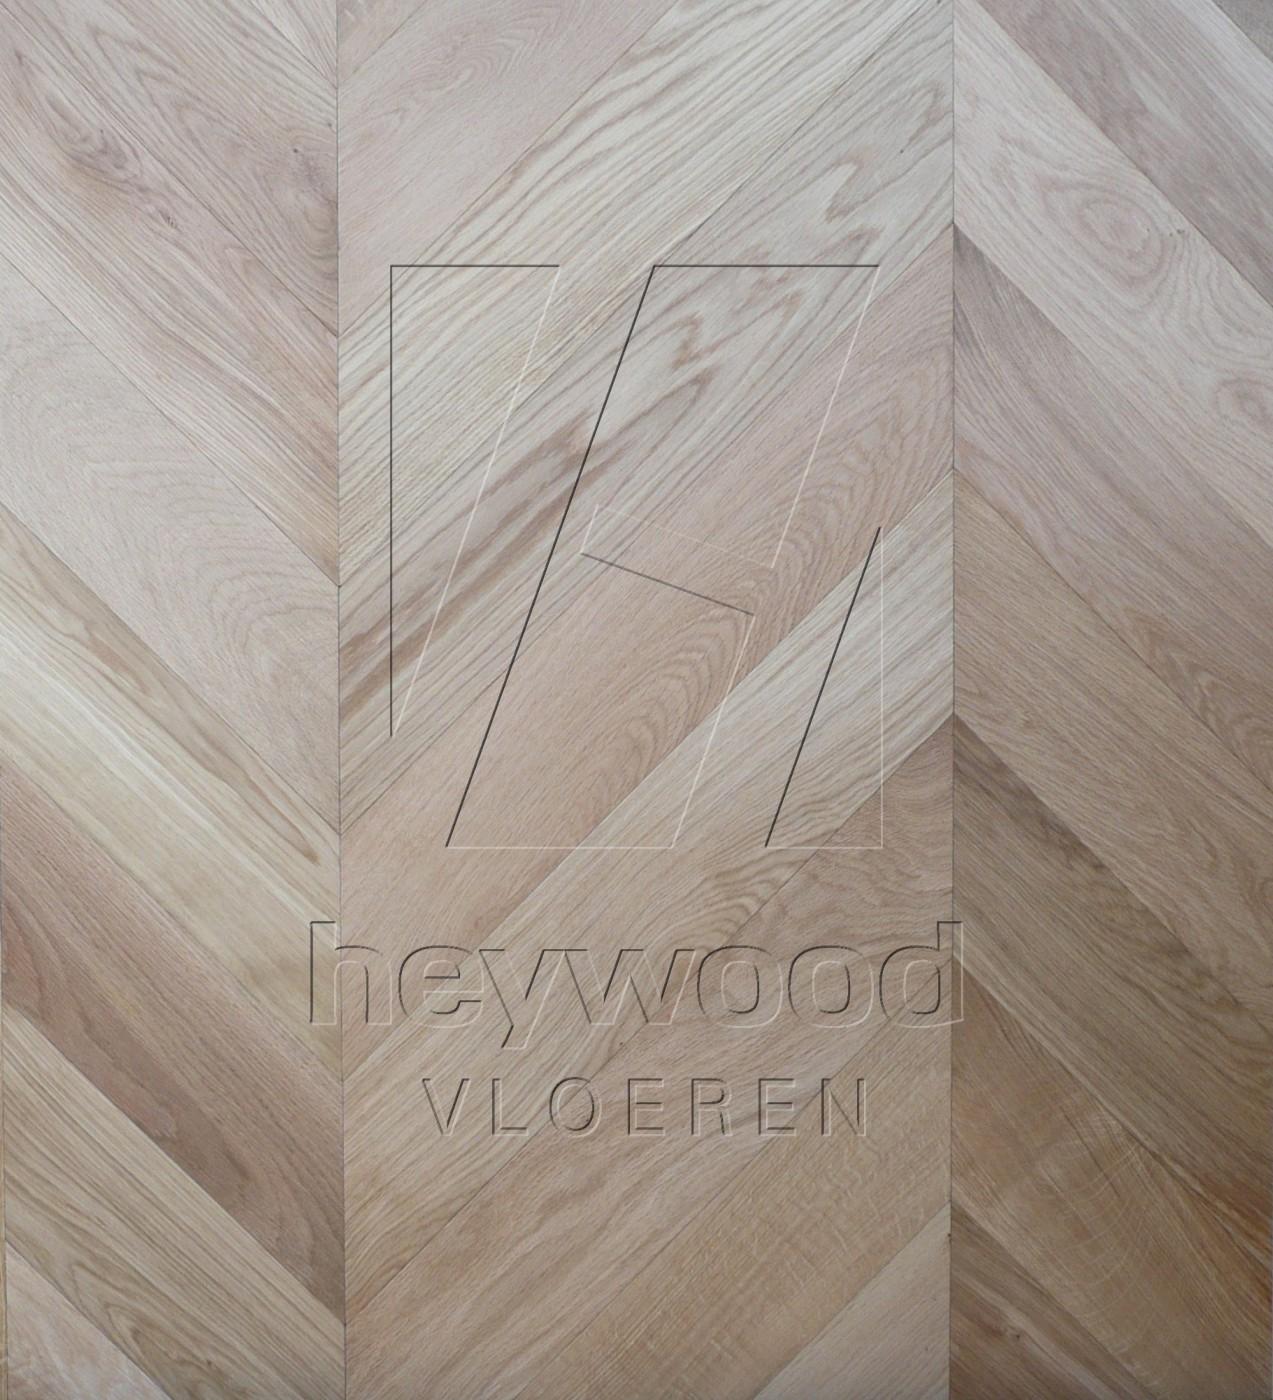 Chevron Oak Elegance Osmo oiled in Chevron of Pattern & Panel Floors